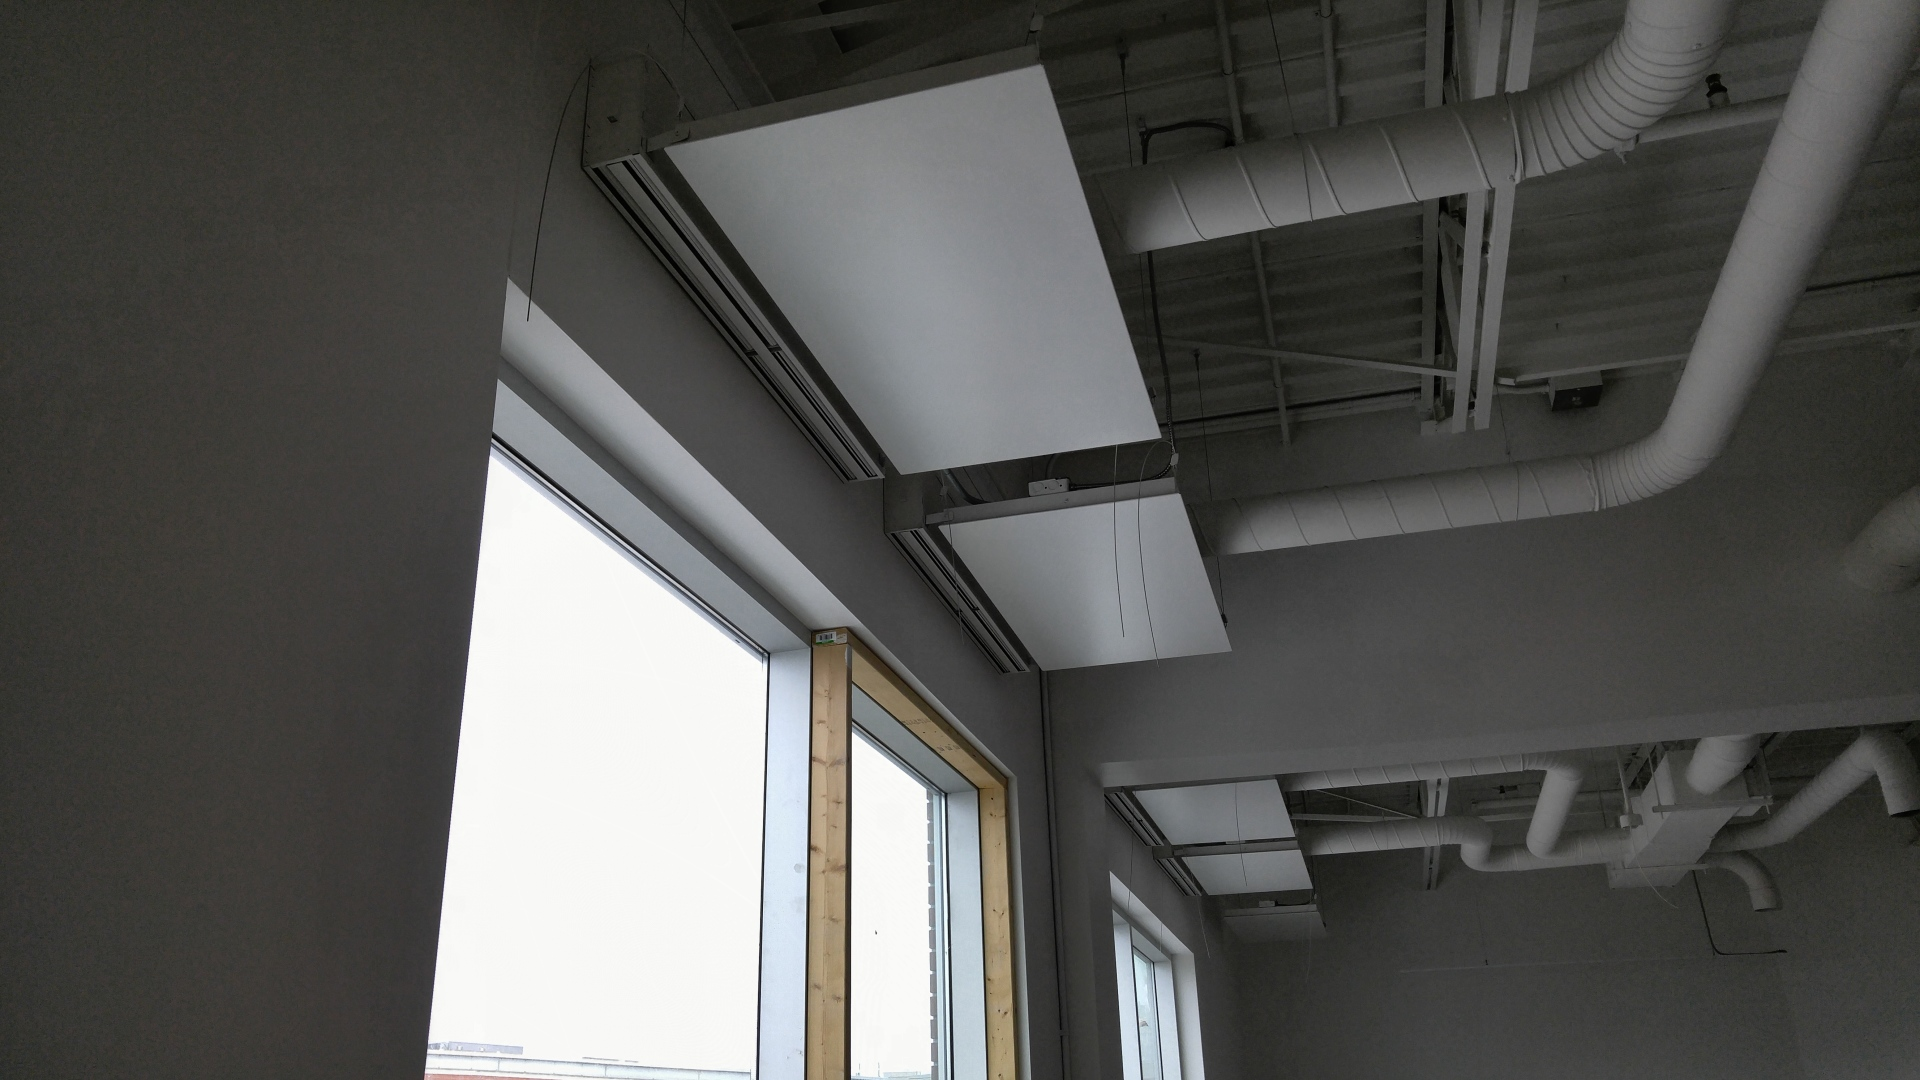 Radiant-Ceiling-Metal-Panels